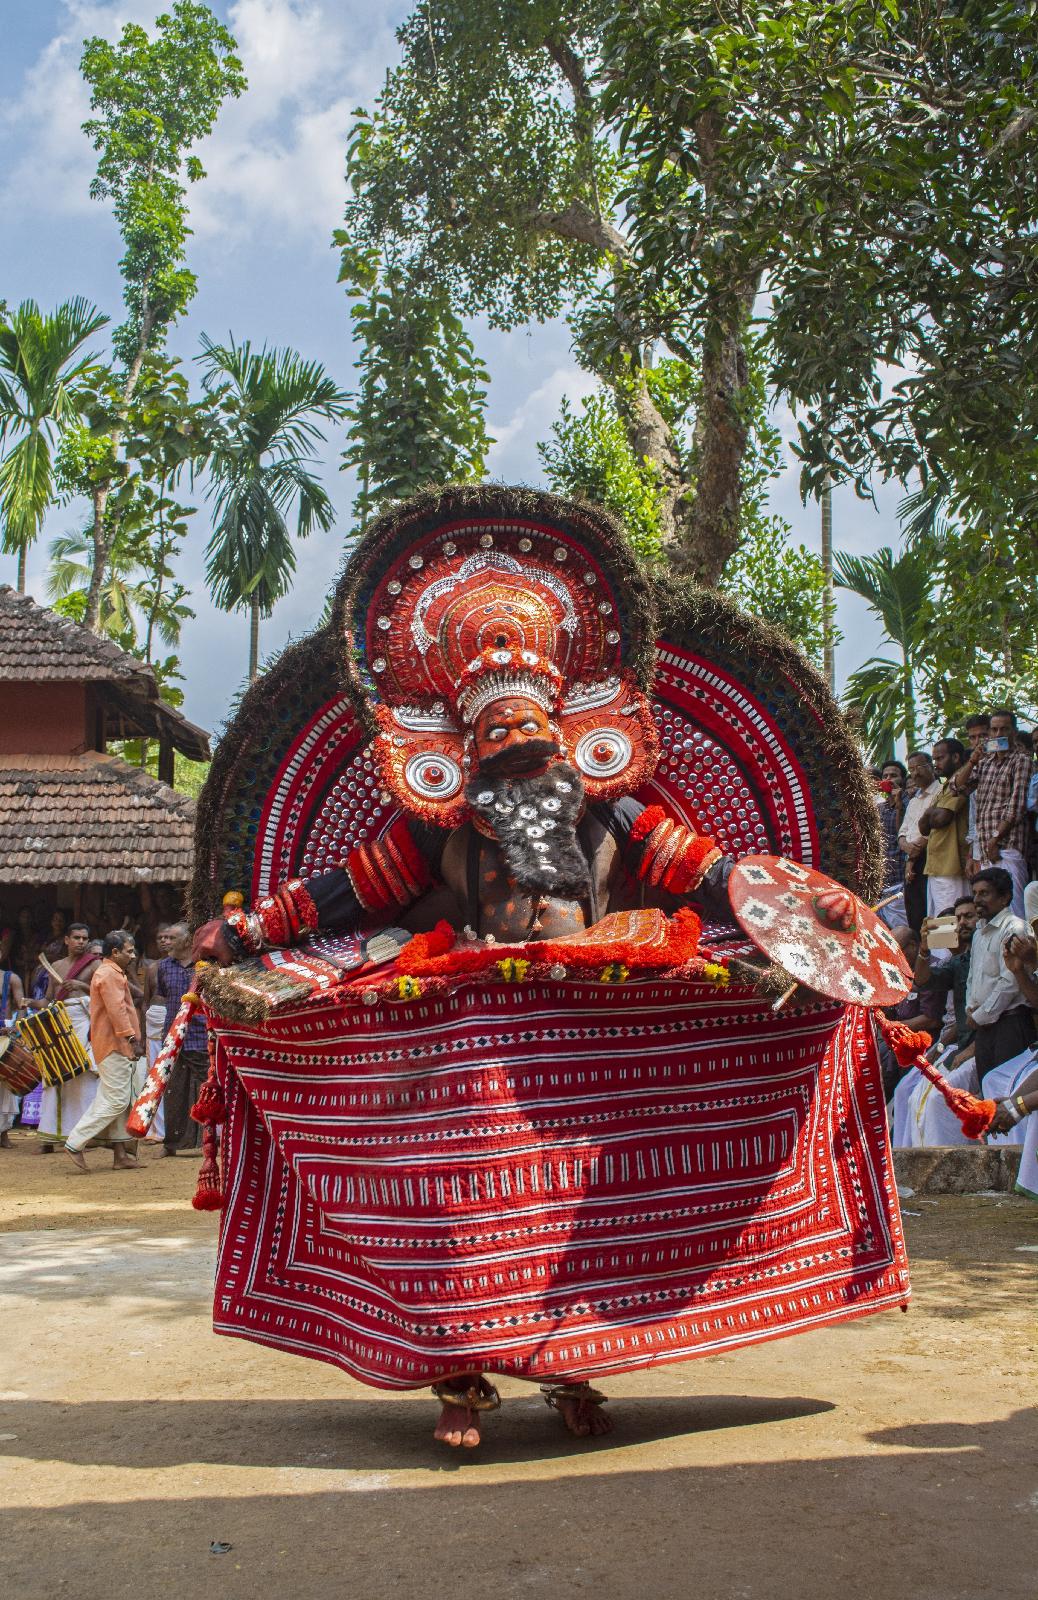 Kuttichathan Theyyam - കുട്ടിച്ചാത്തന് തെയ്യം